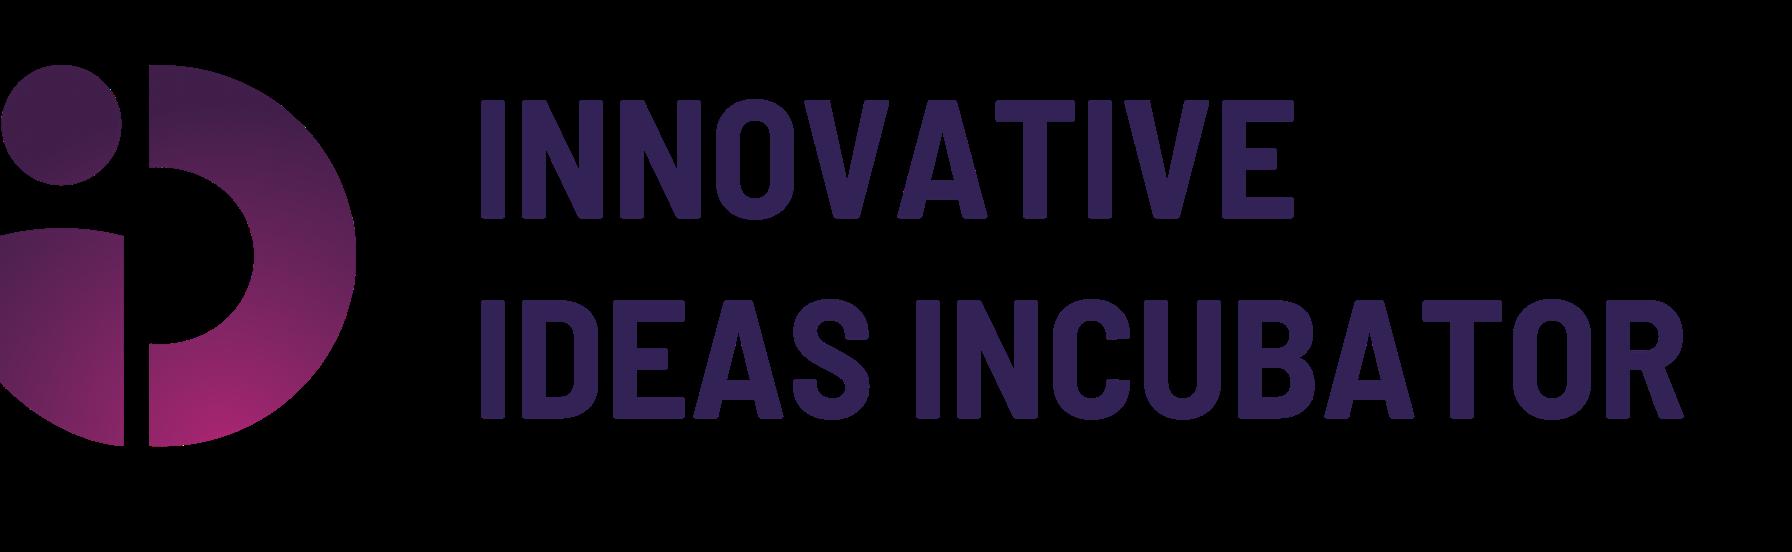 Innovative Ideas Incubator